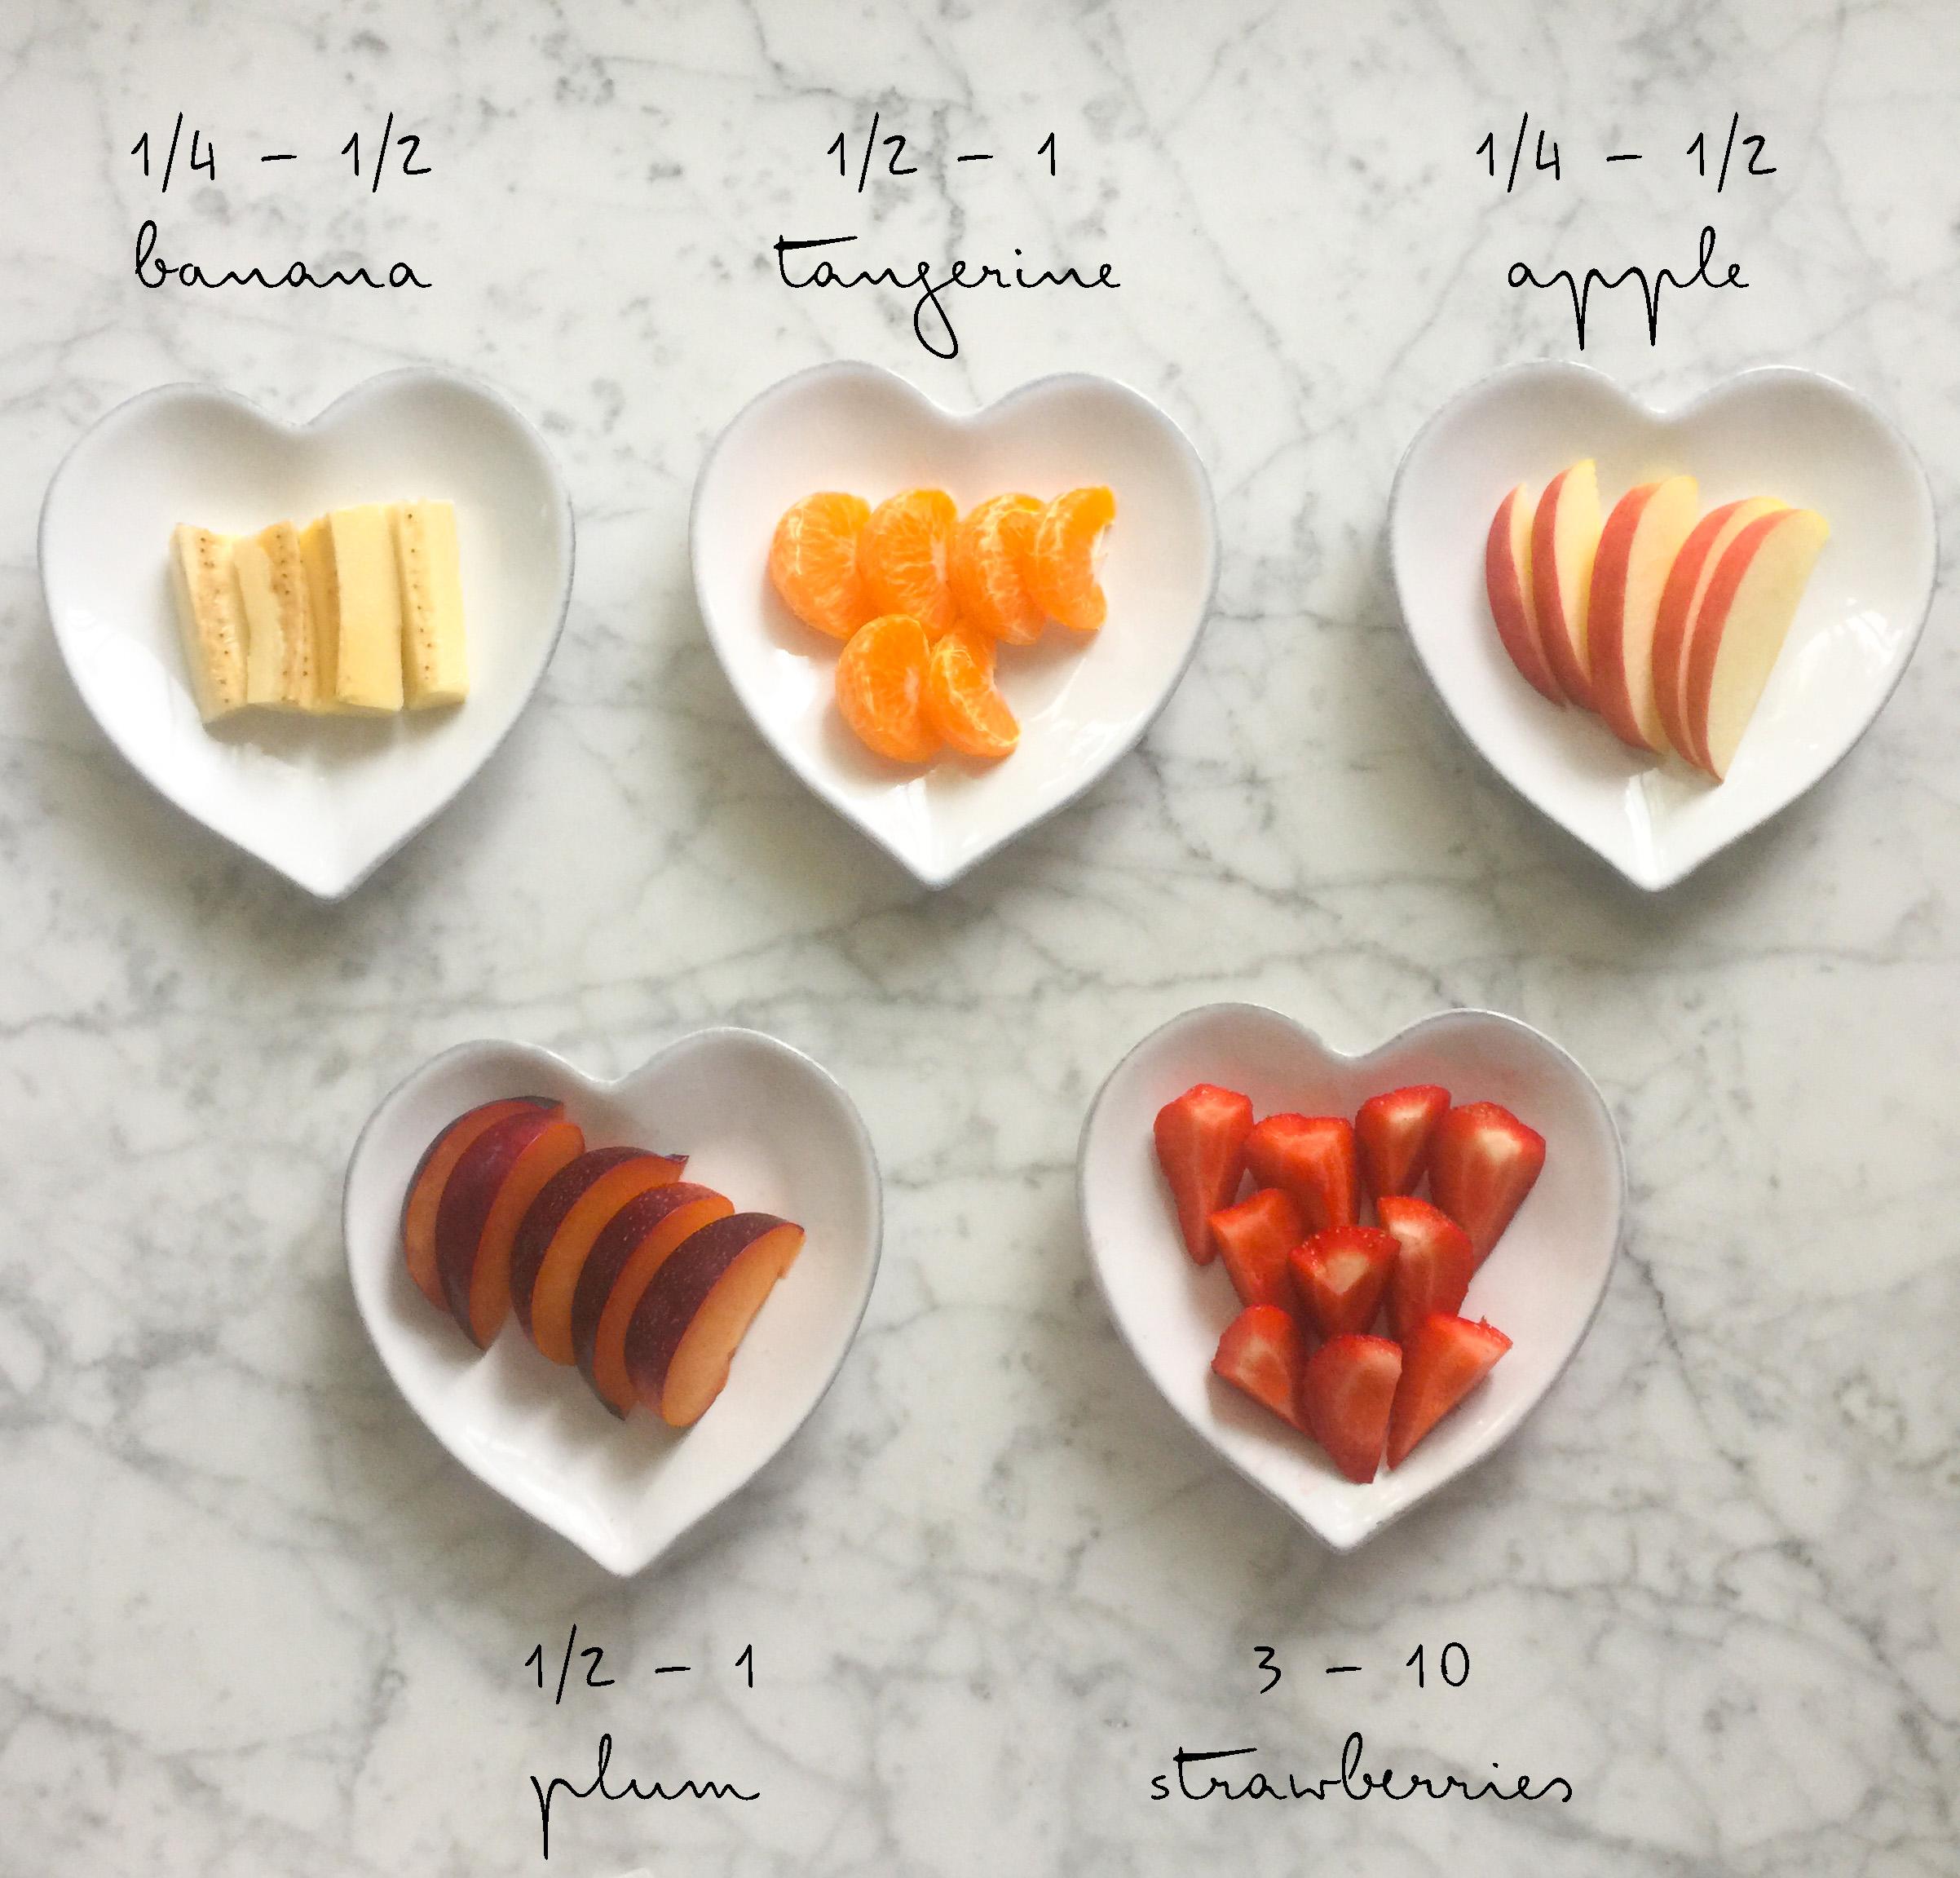 portoinsizefruit.jpg